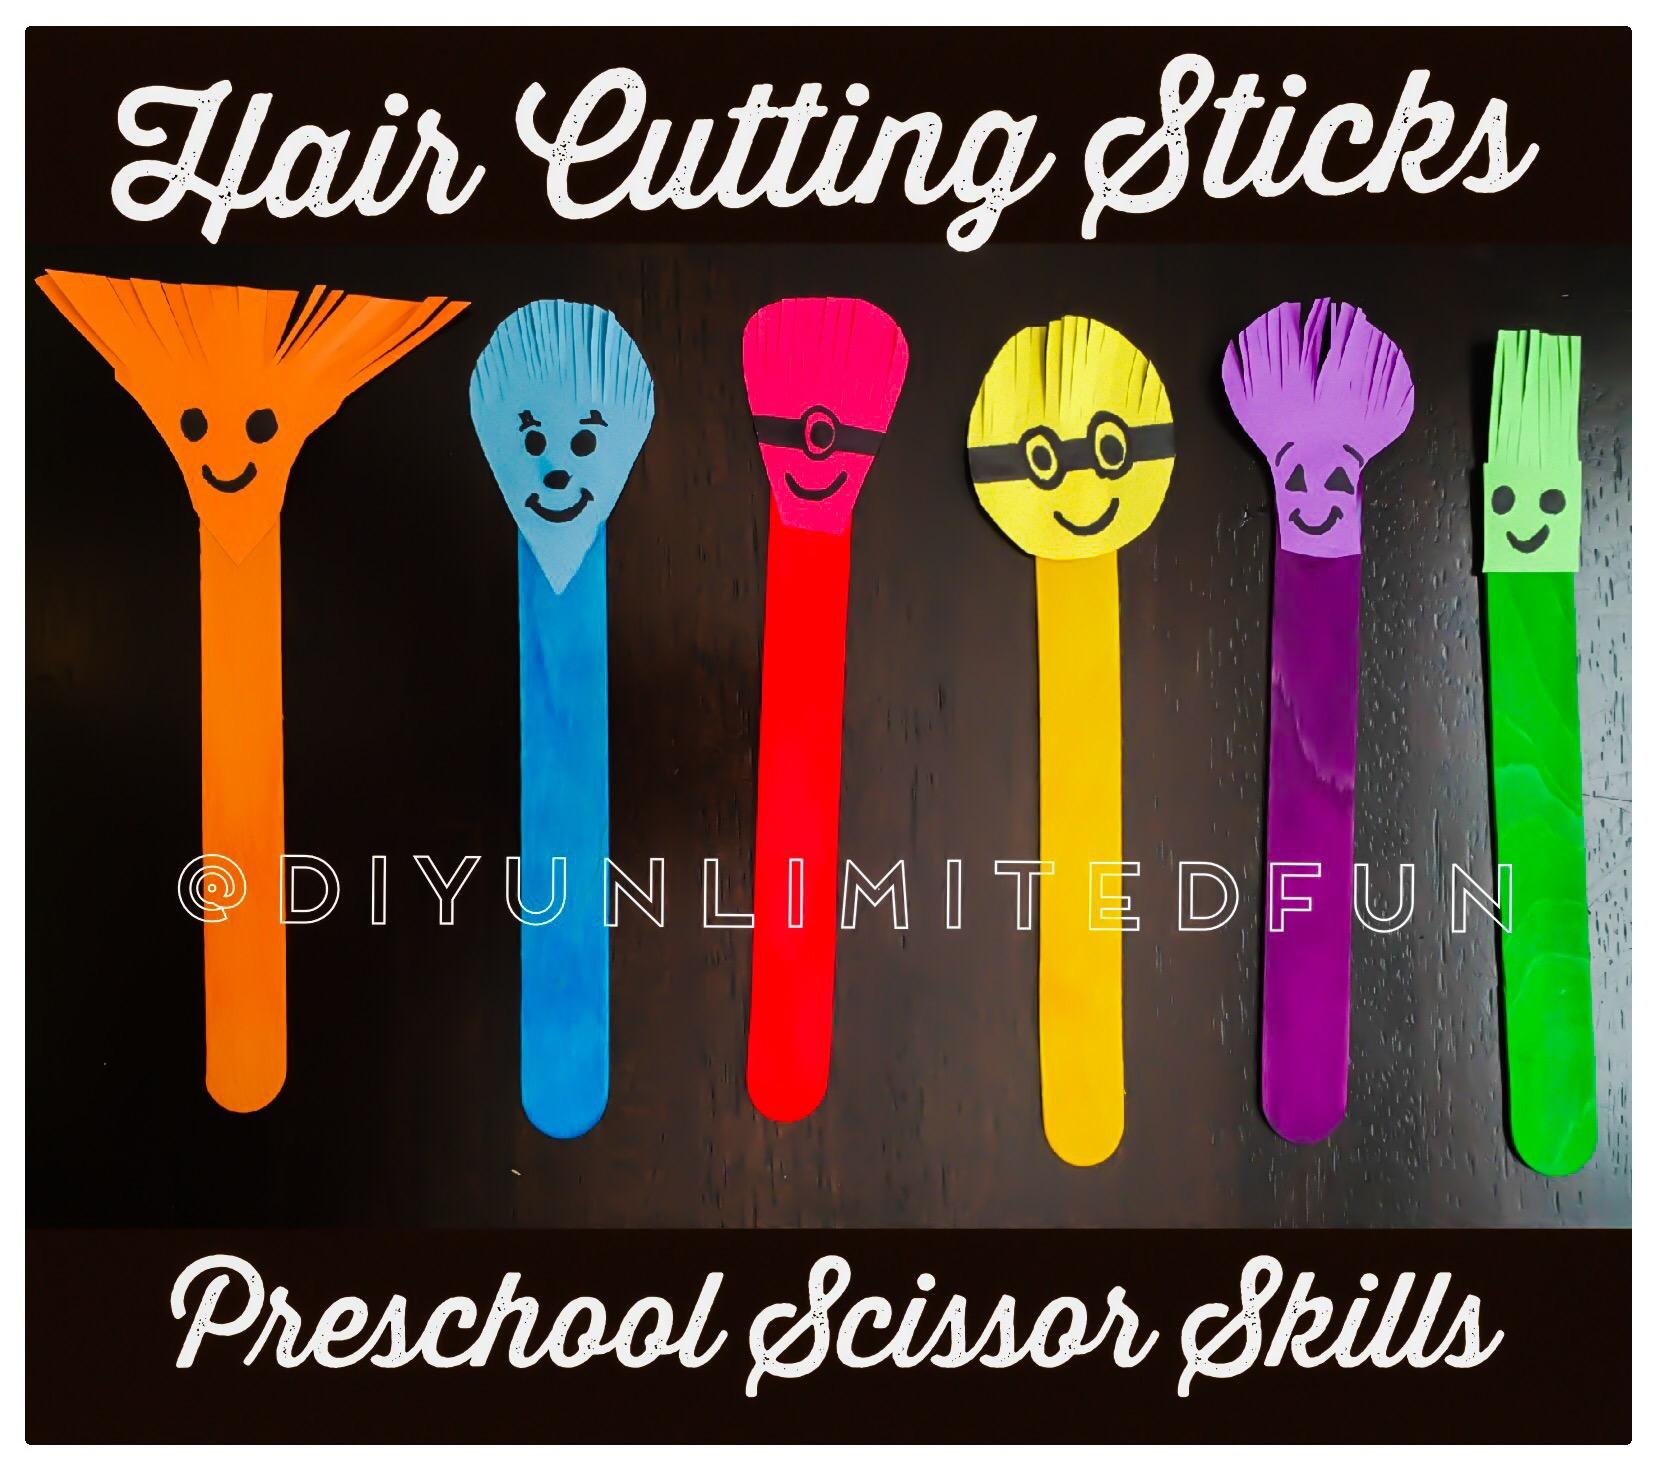 Hair Cutting Sticks Preschool Scissor Skills Simple